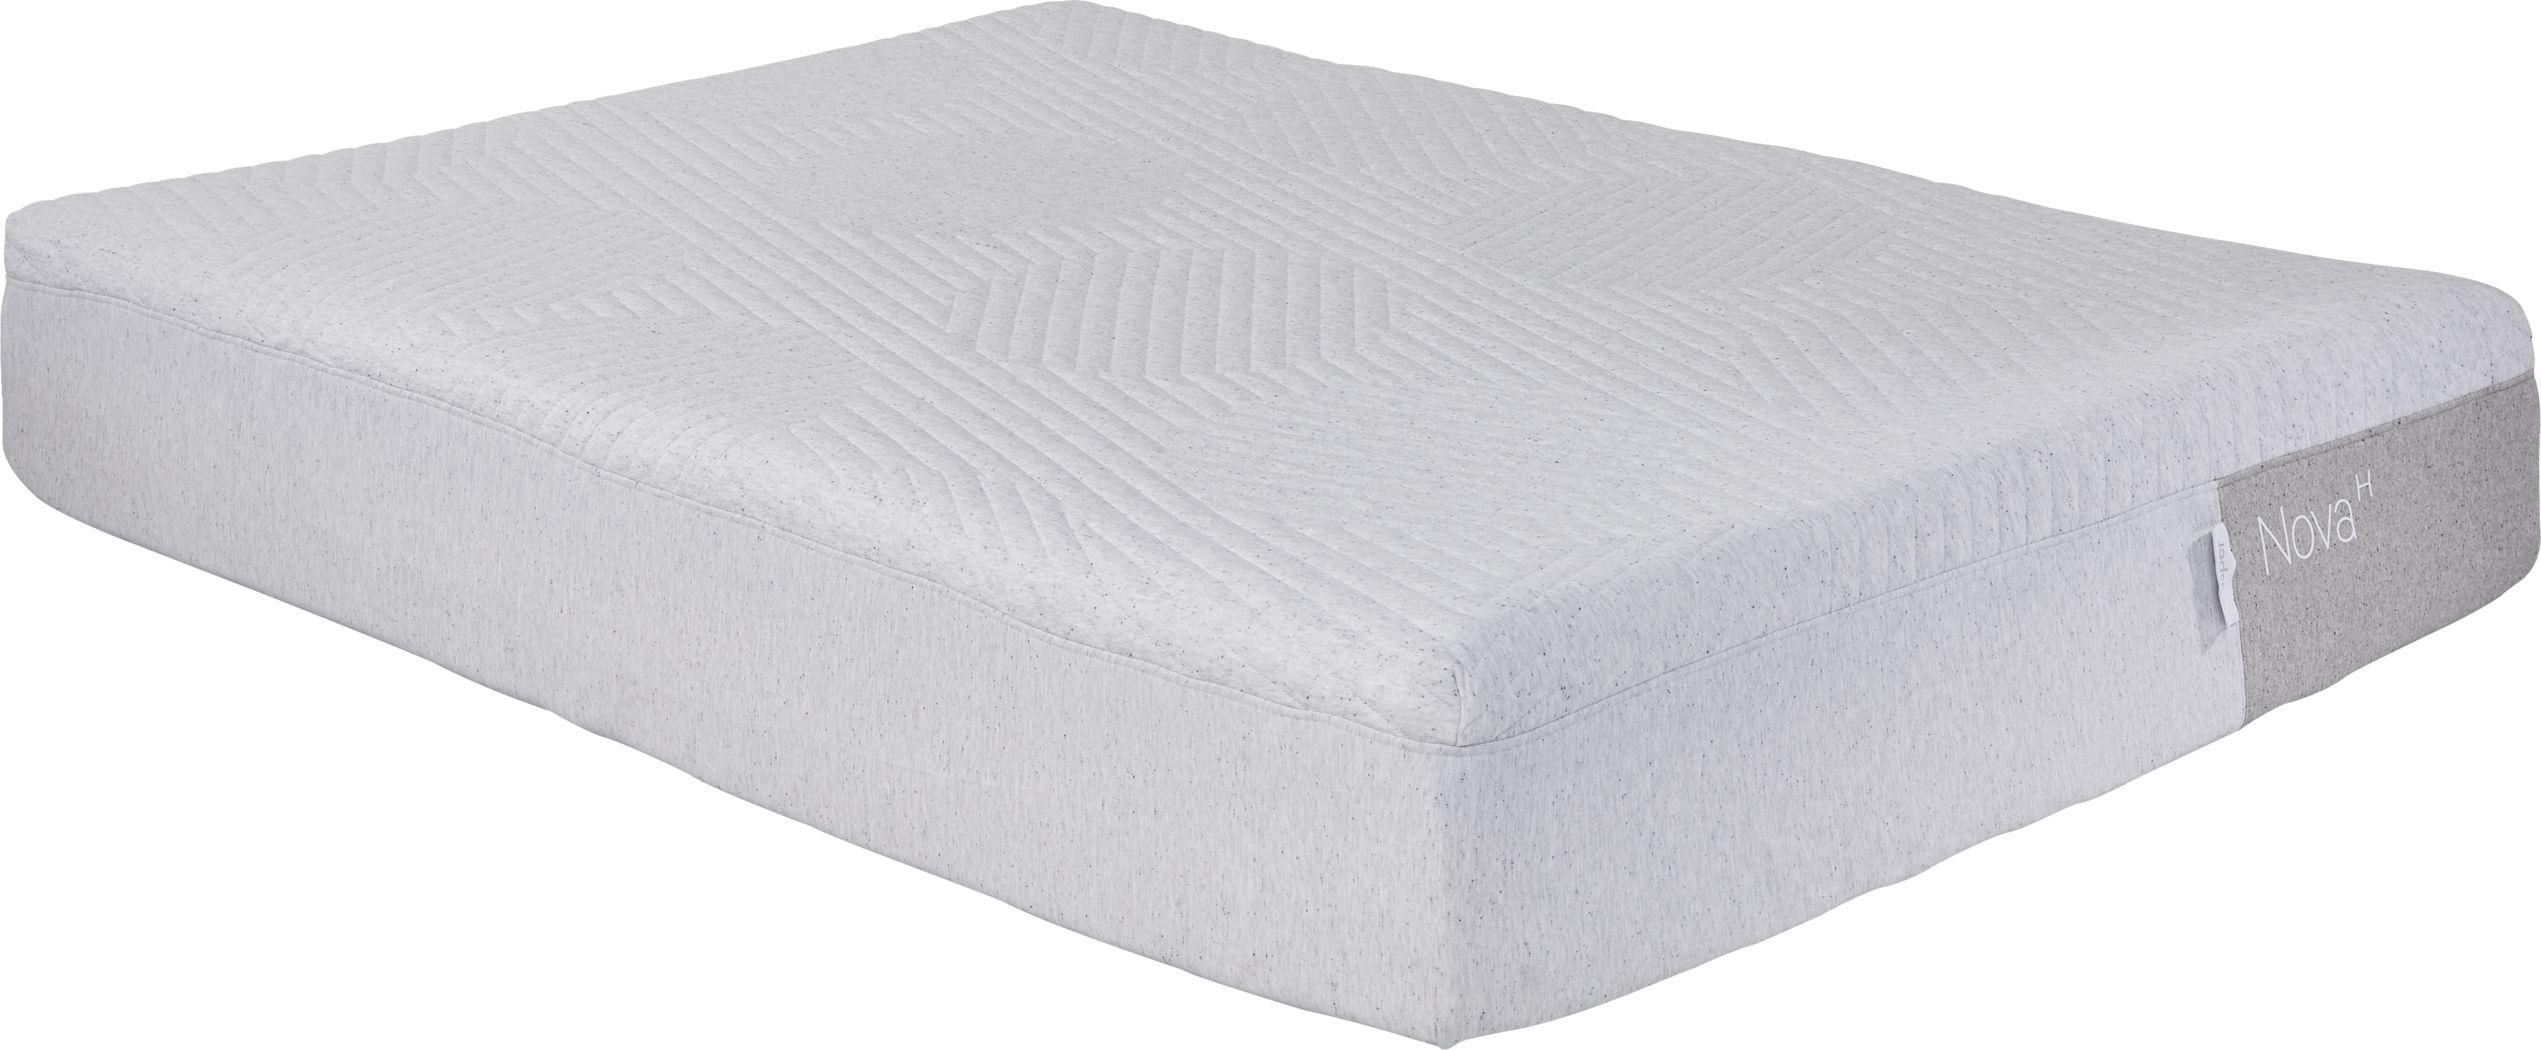 Casper Mattresses Beds Frames Easy To Assemble Bed Sets